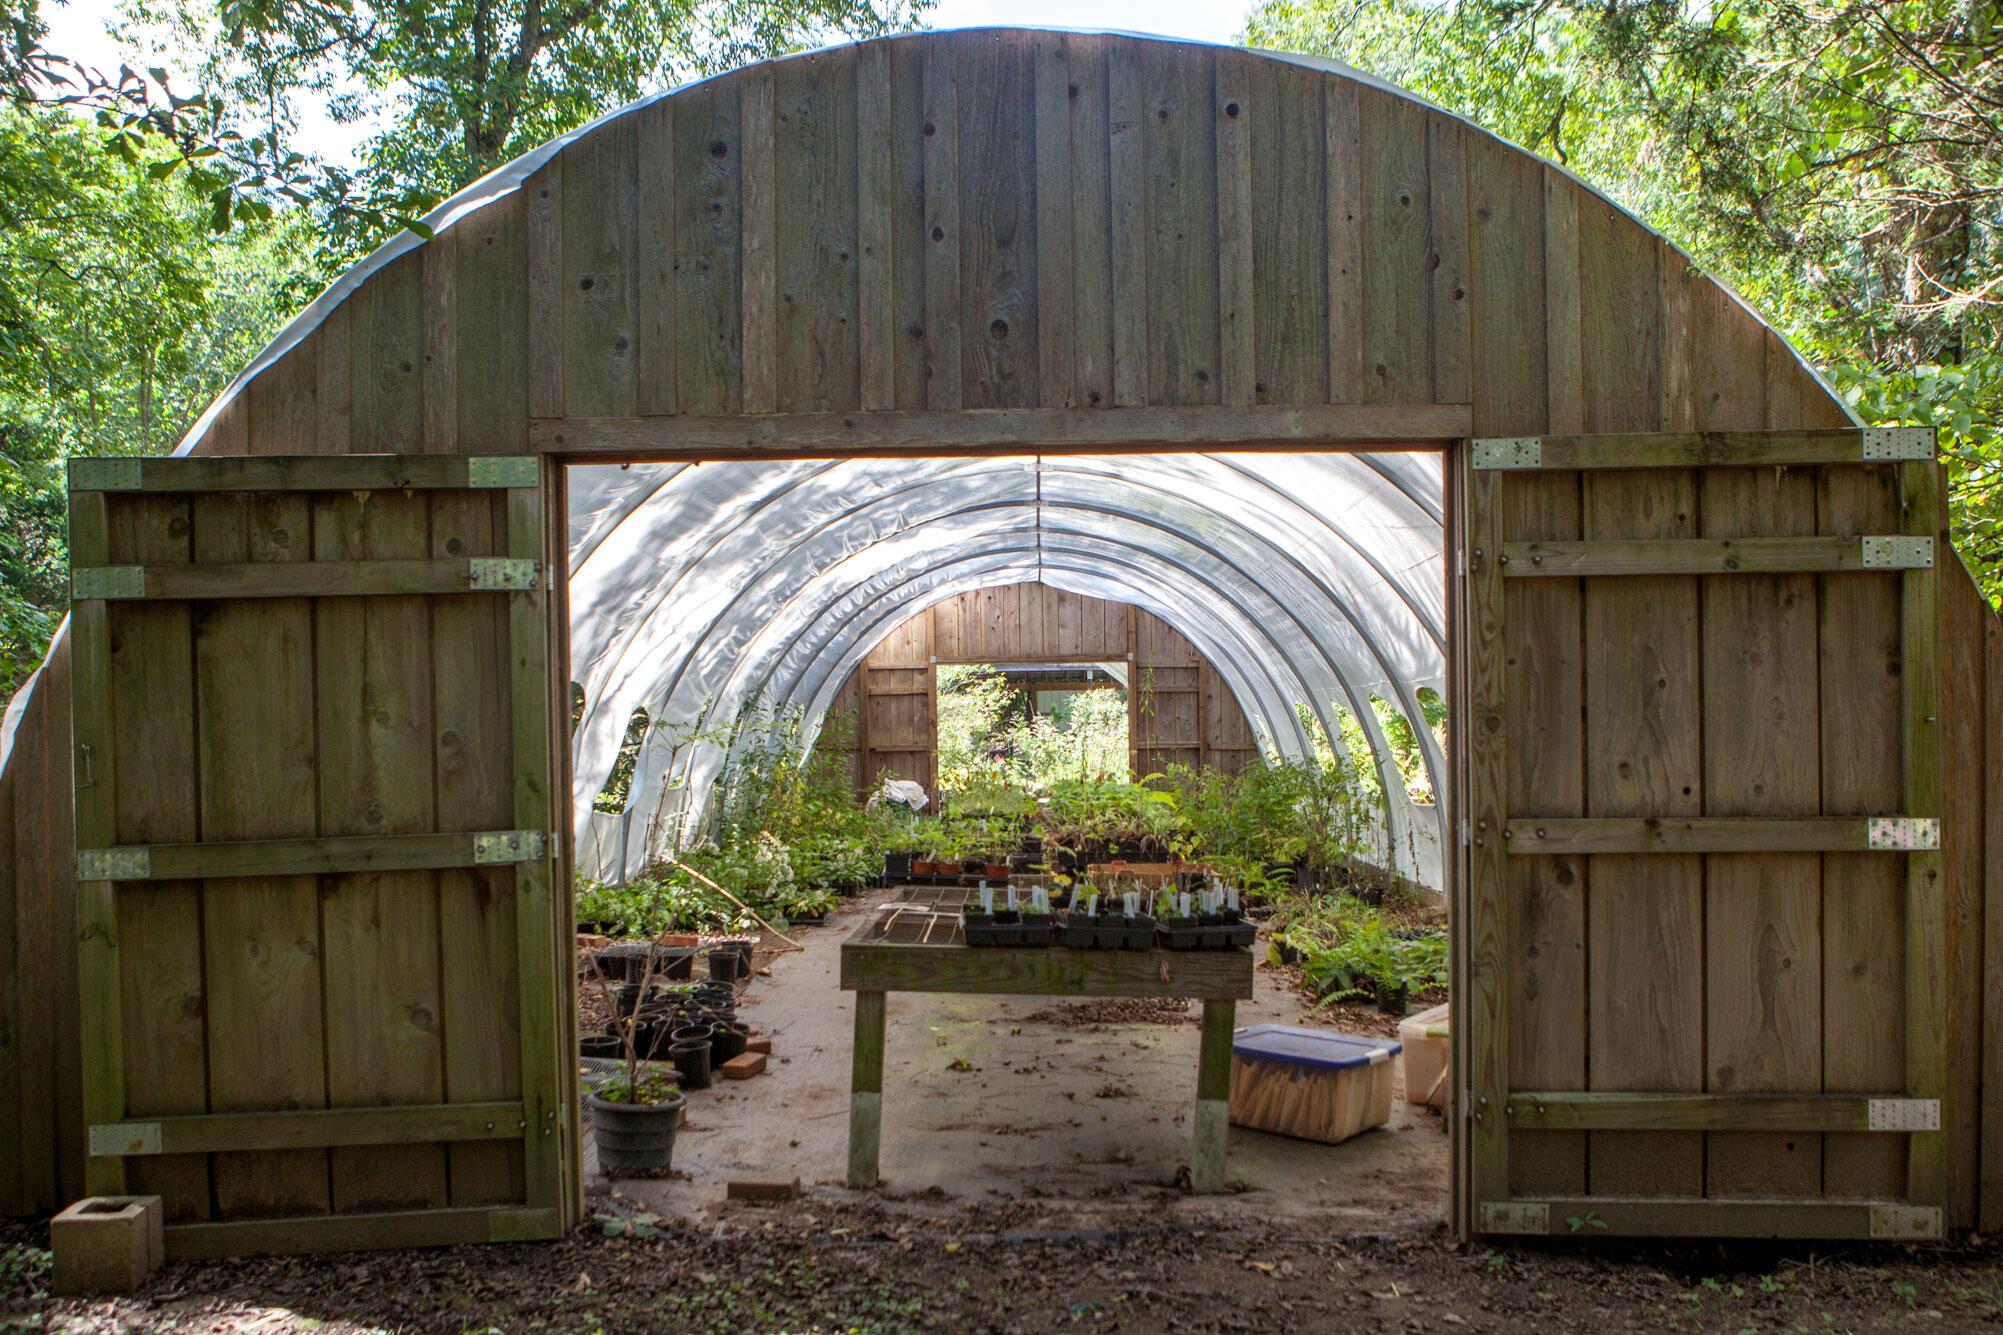 The Strawberry Plains native plants nursery. Camilla Cerea/Audubon